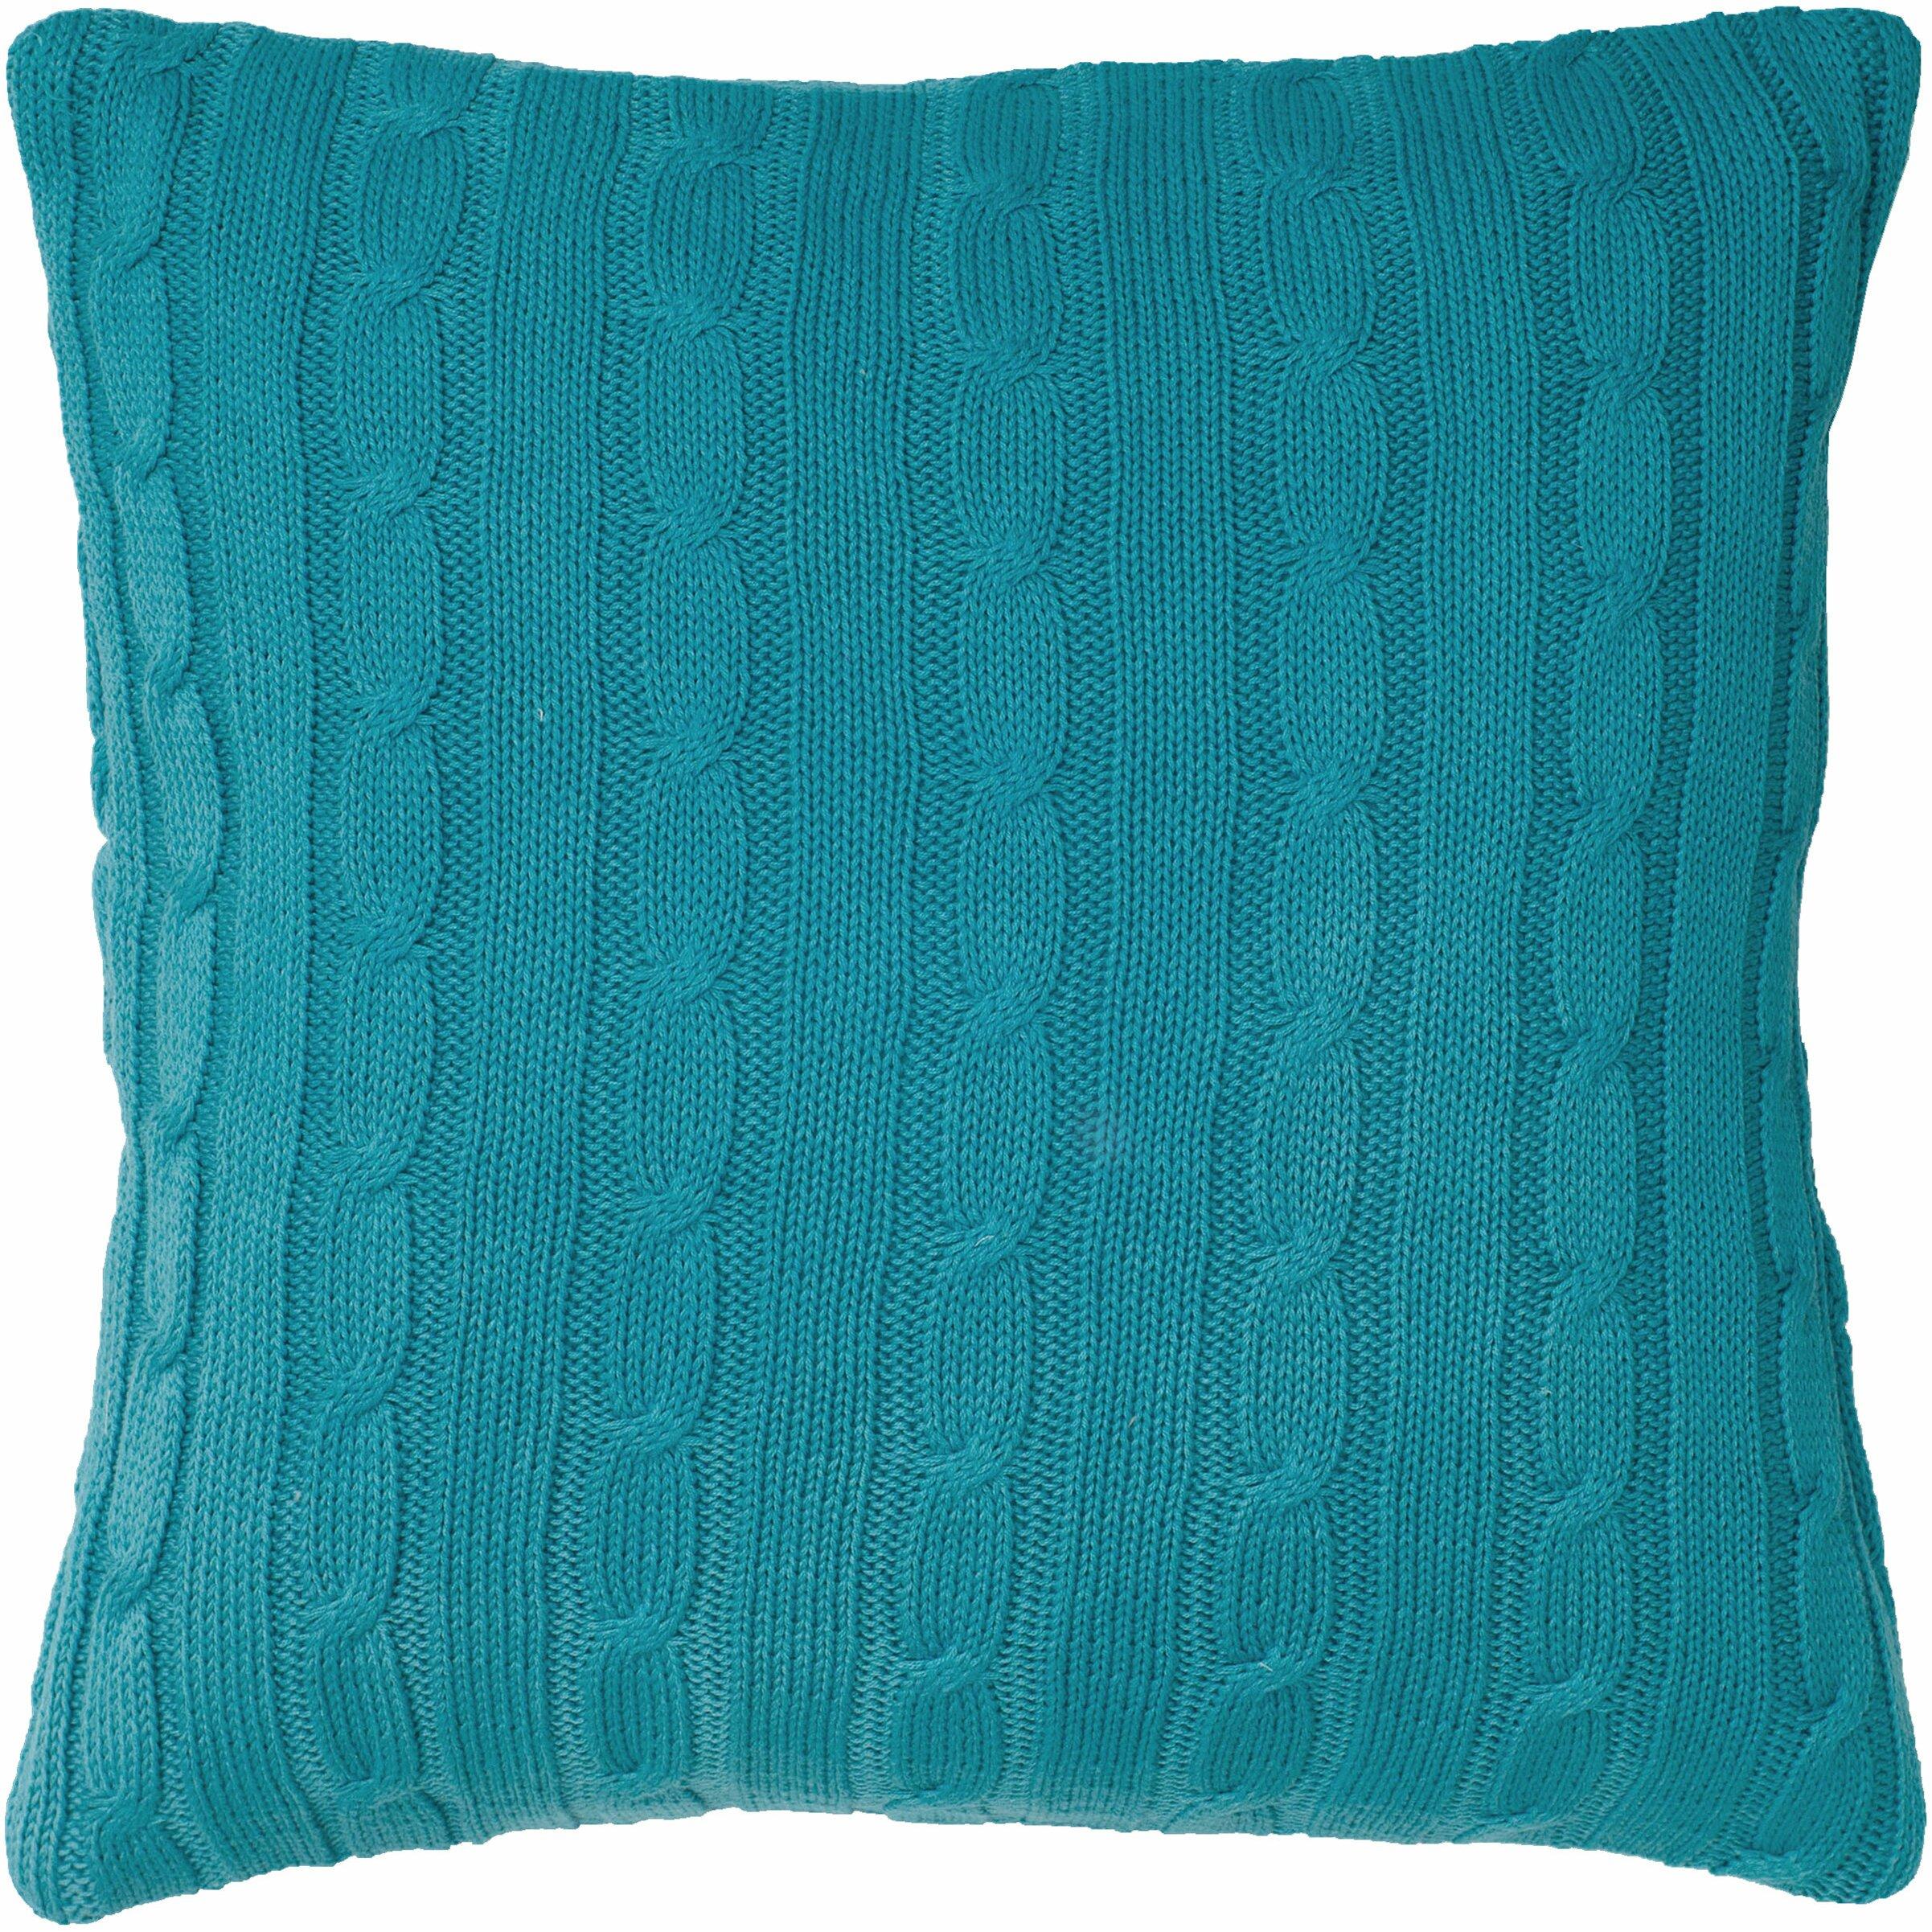 Wildon Home Cable Knit Wooden Button Closure Throw Pillow & Reviews Wayfair